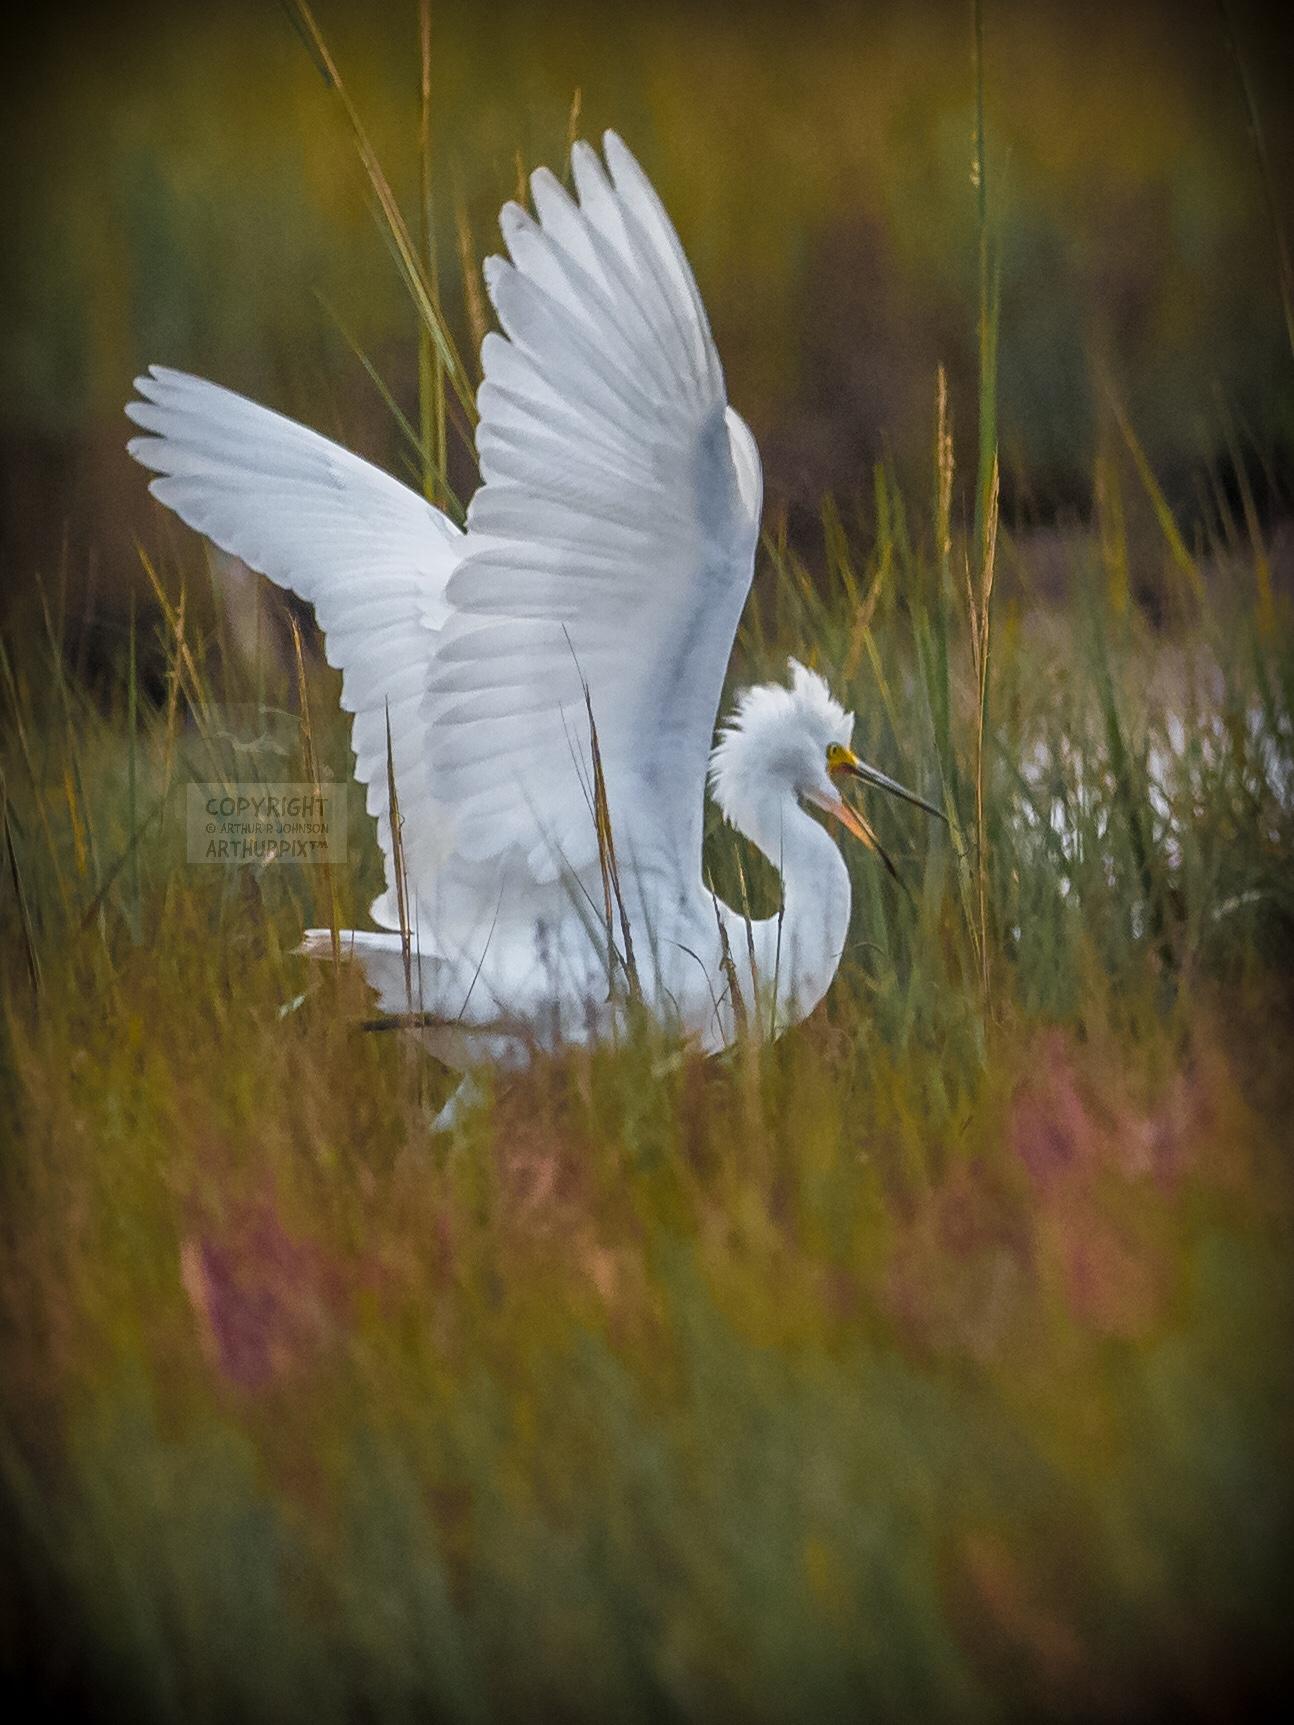 Juvenile Egret Calling, Wings Extended